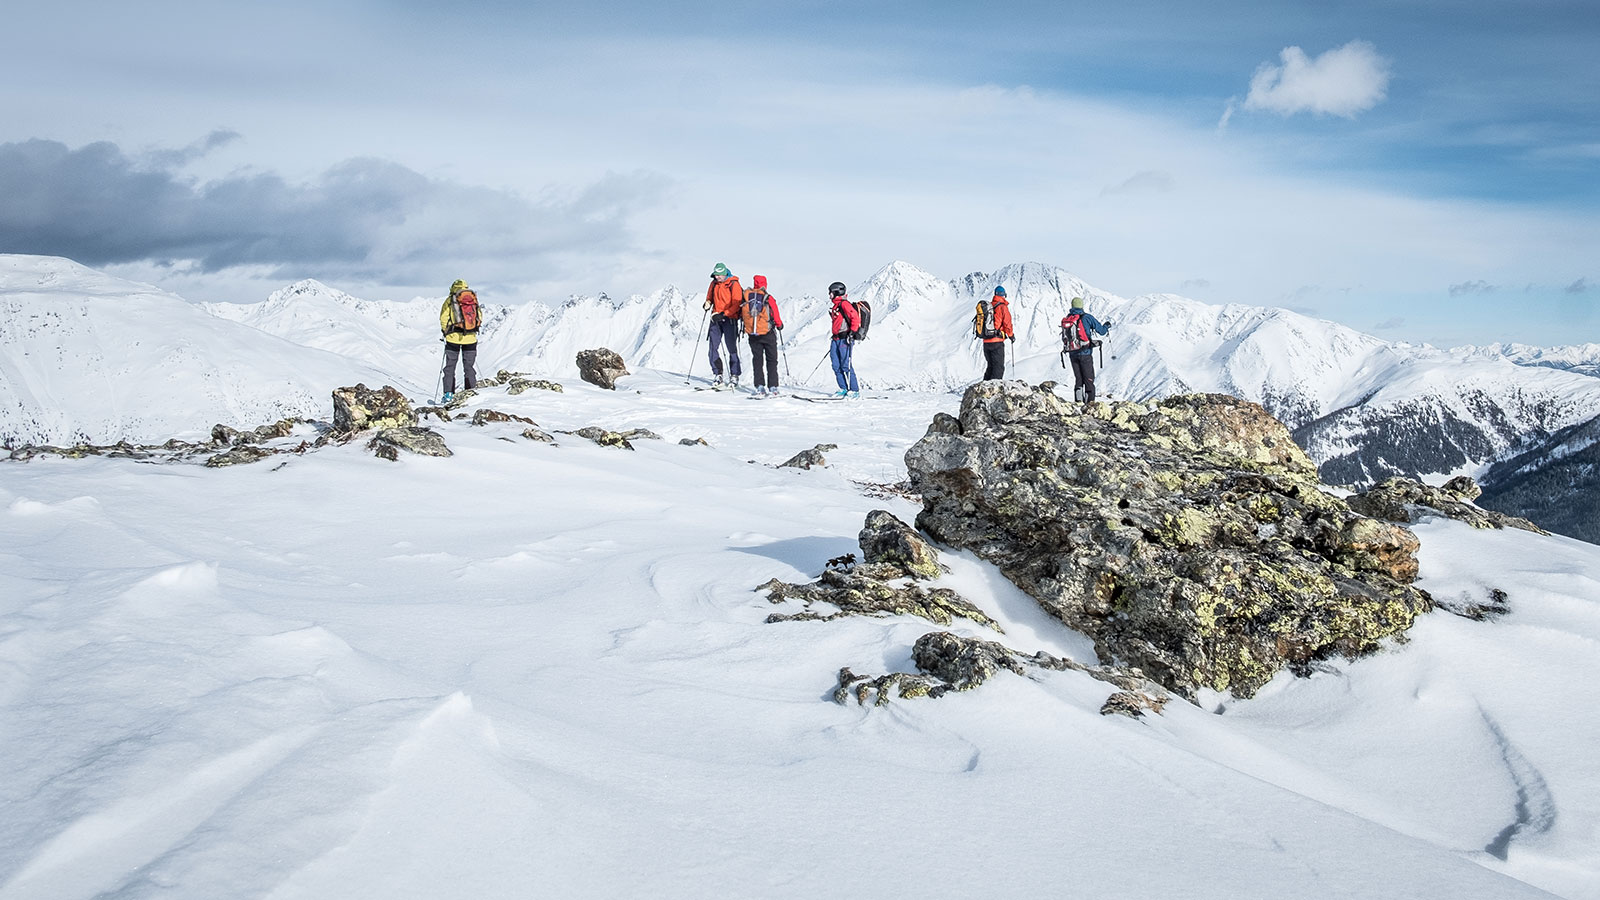 Rundblick. Skitour in Osttirol | Pauli Trenkwalder, Berge & Psychologie